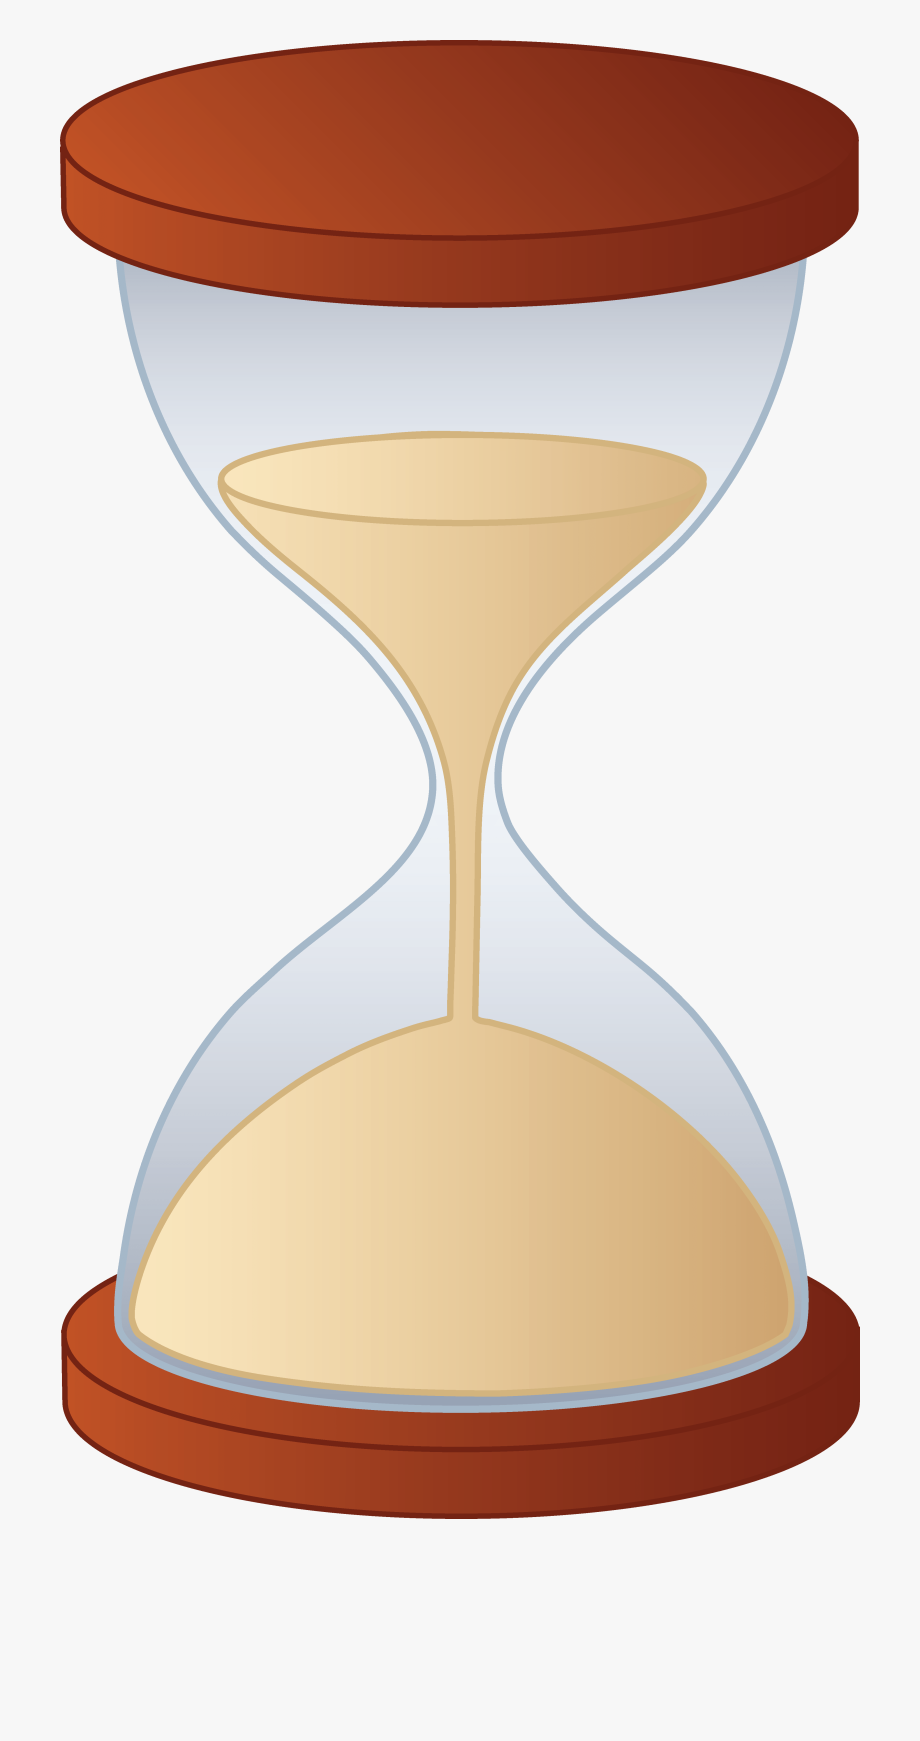 Hourglass clipart inevitable. Download transparent cartoon free